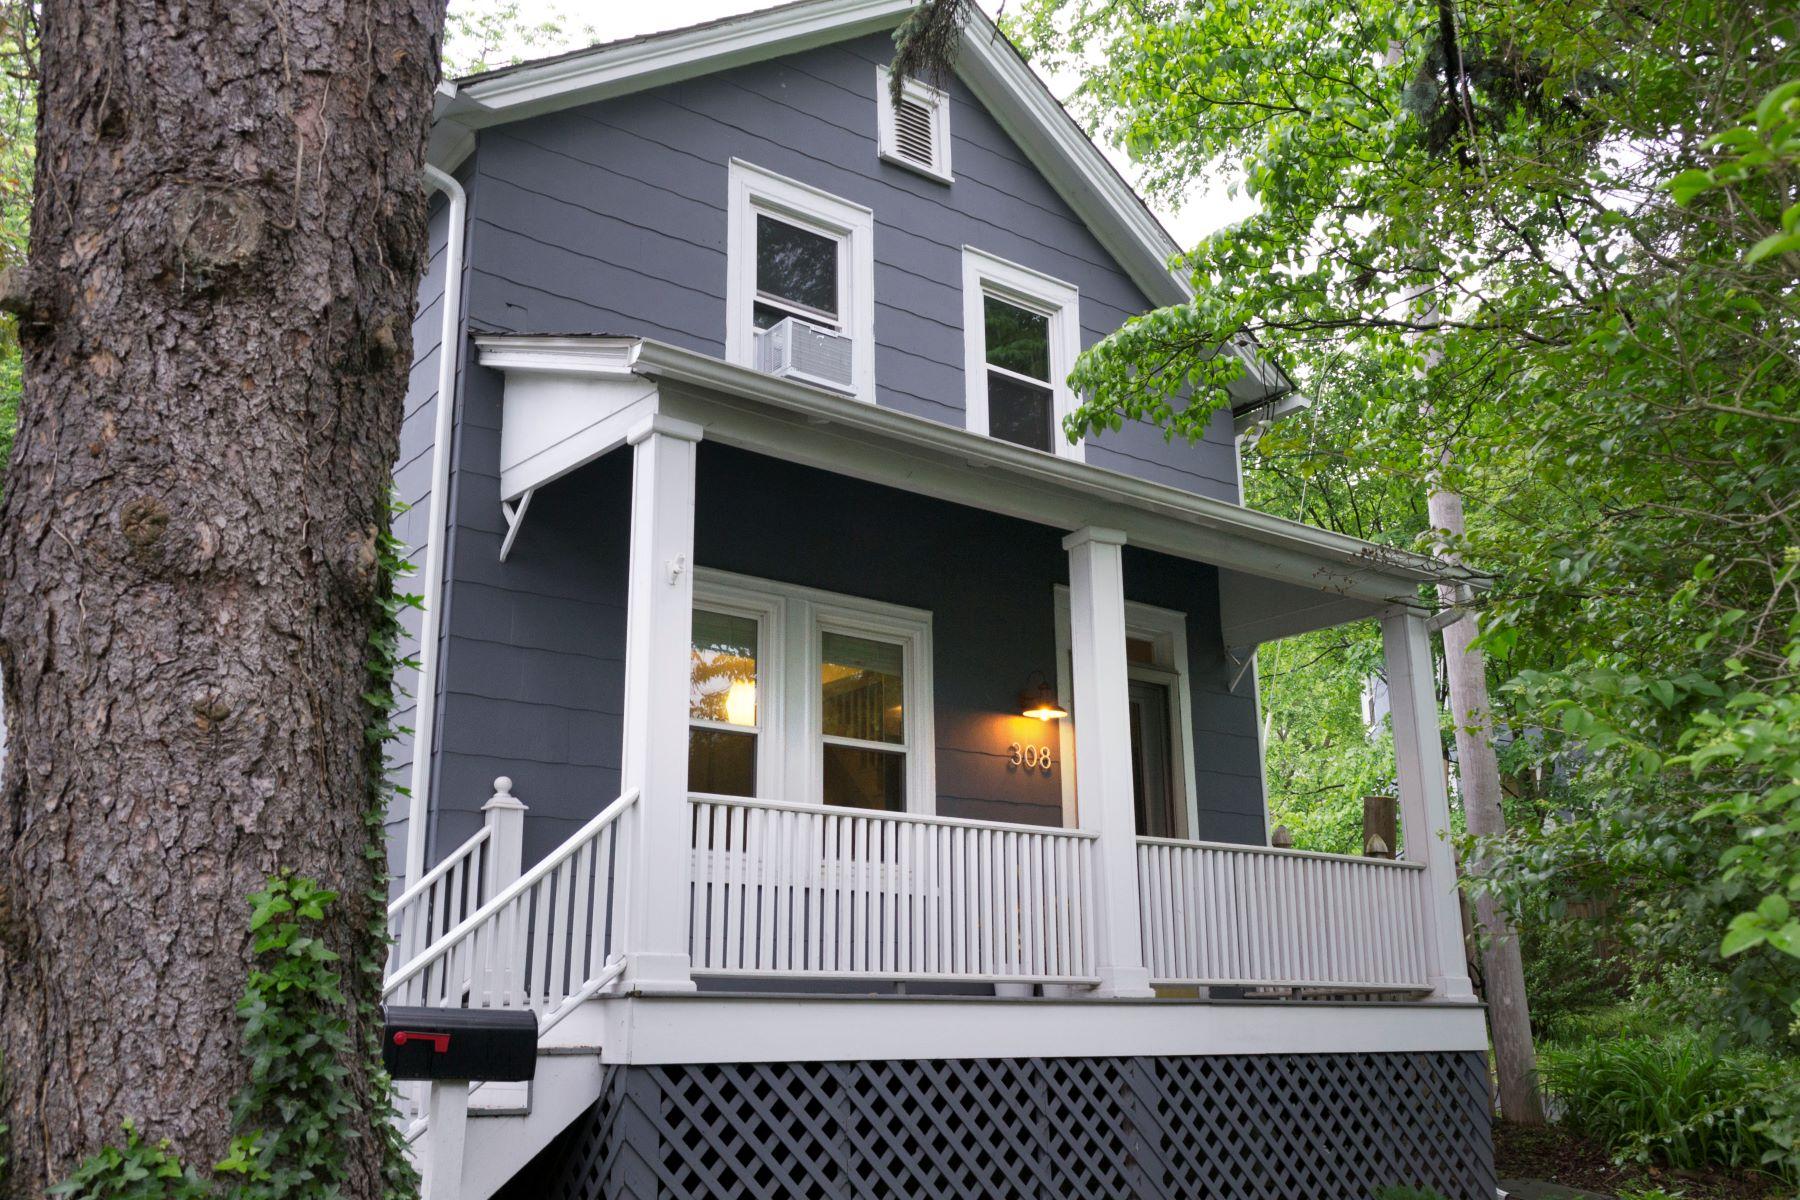 独户住宅 为 销售 在 Picture Perfect Village Colonial - Sale Pending 308 North Highland Avenue 奈亚克, 纽约州 10960 美国